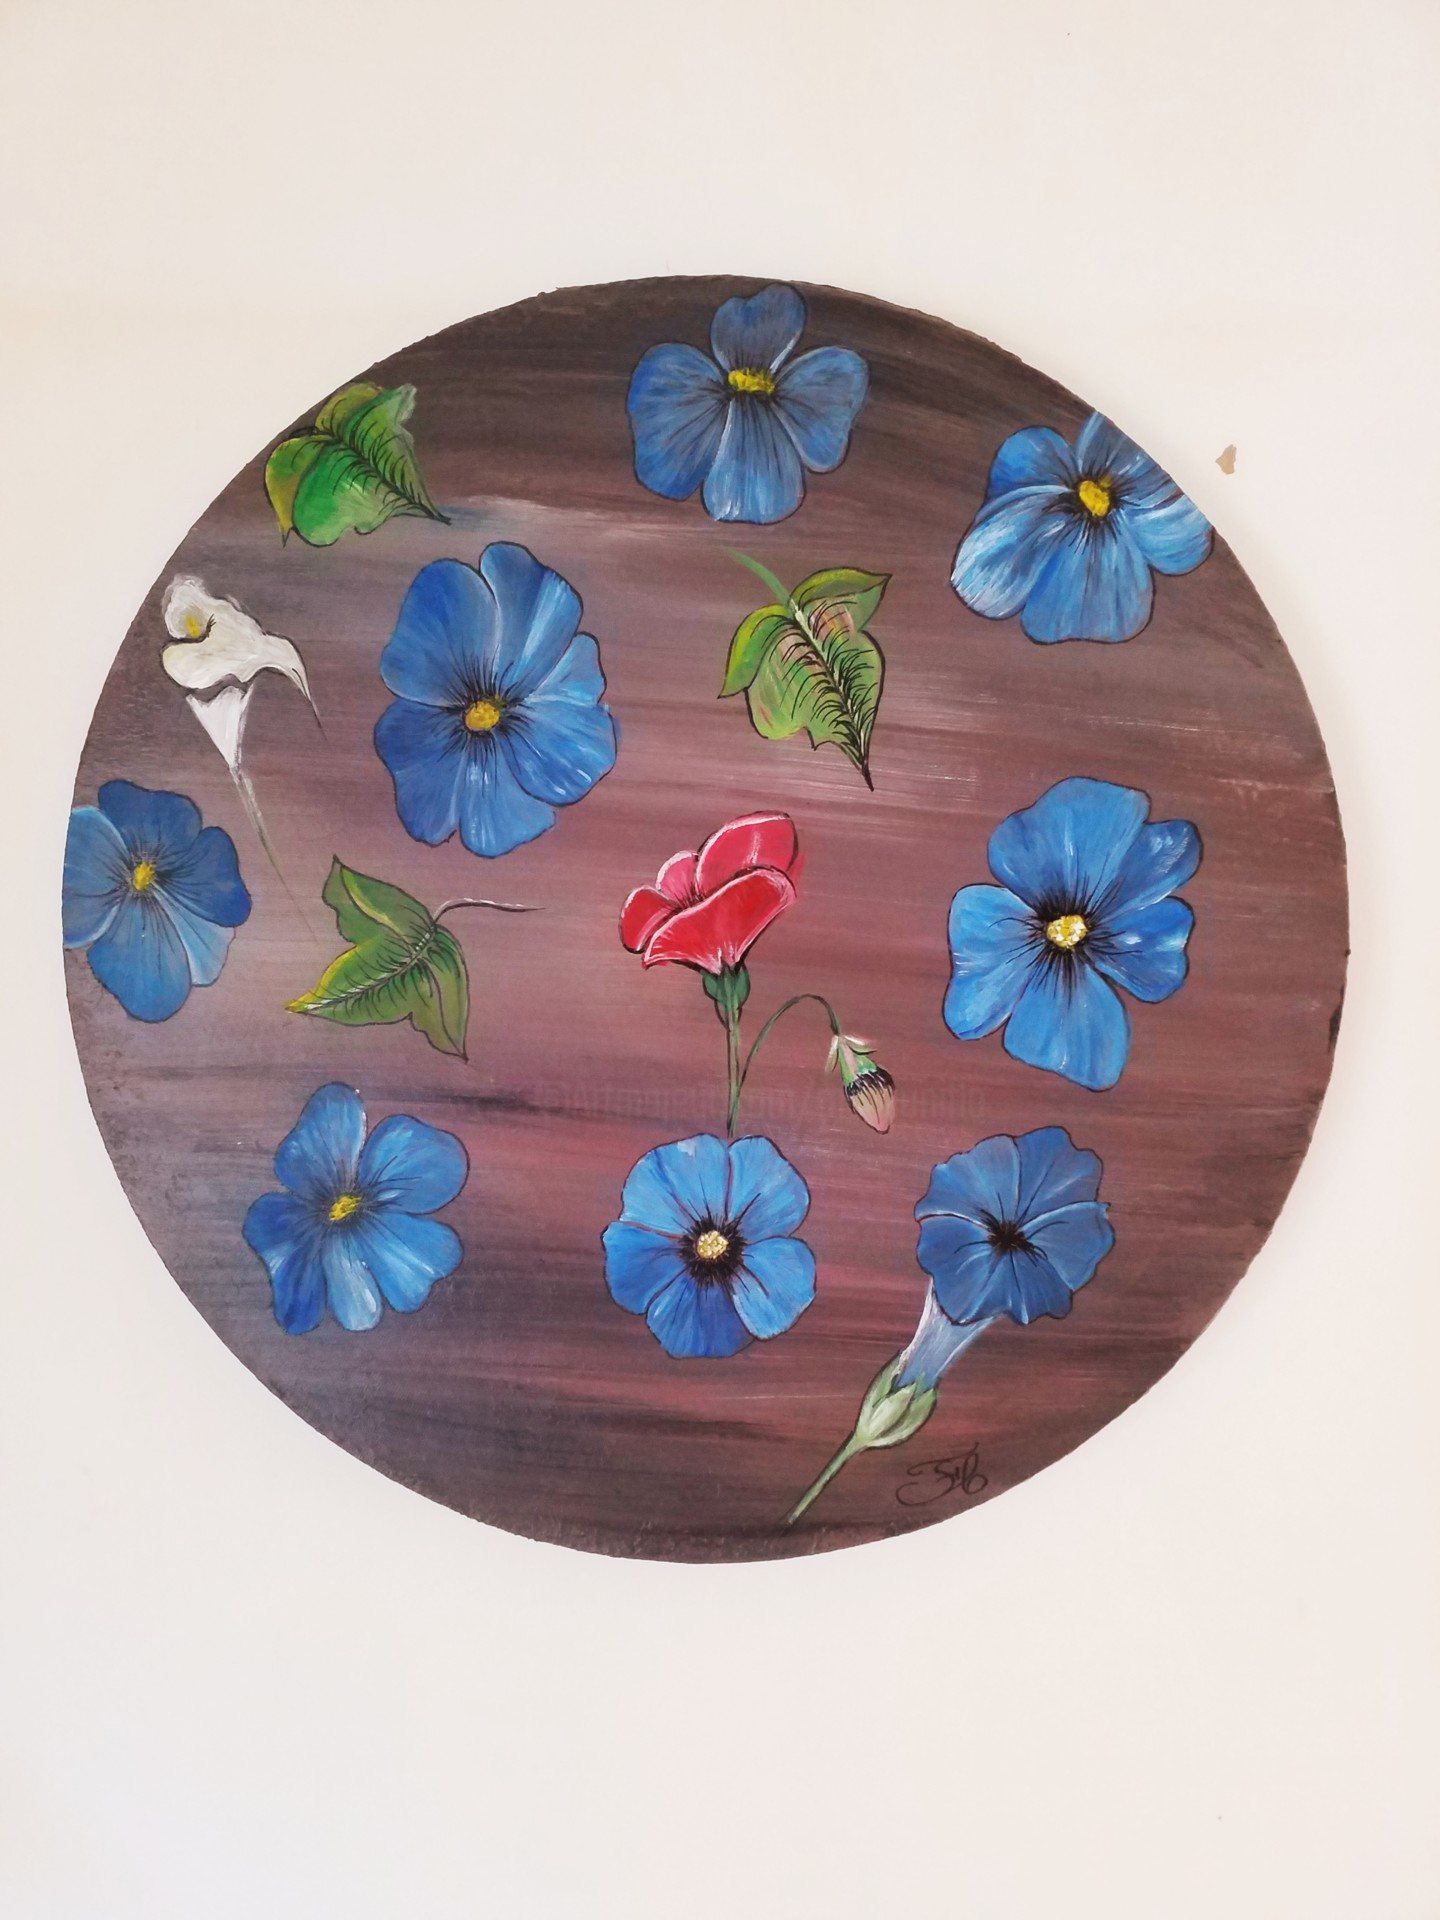 Florence Castelli  Flofloyd - Un rêve de fleurs